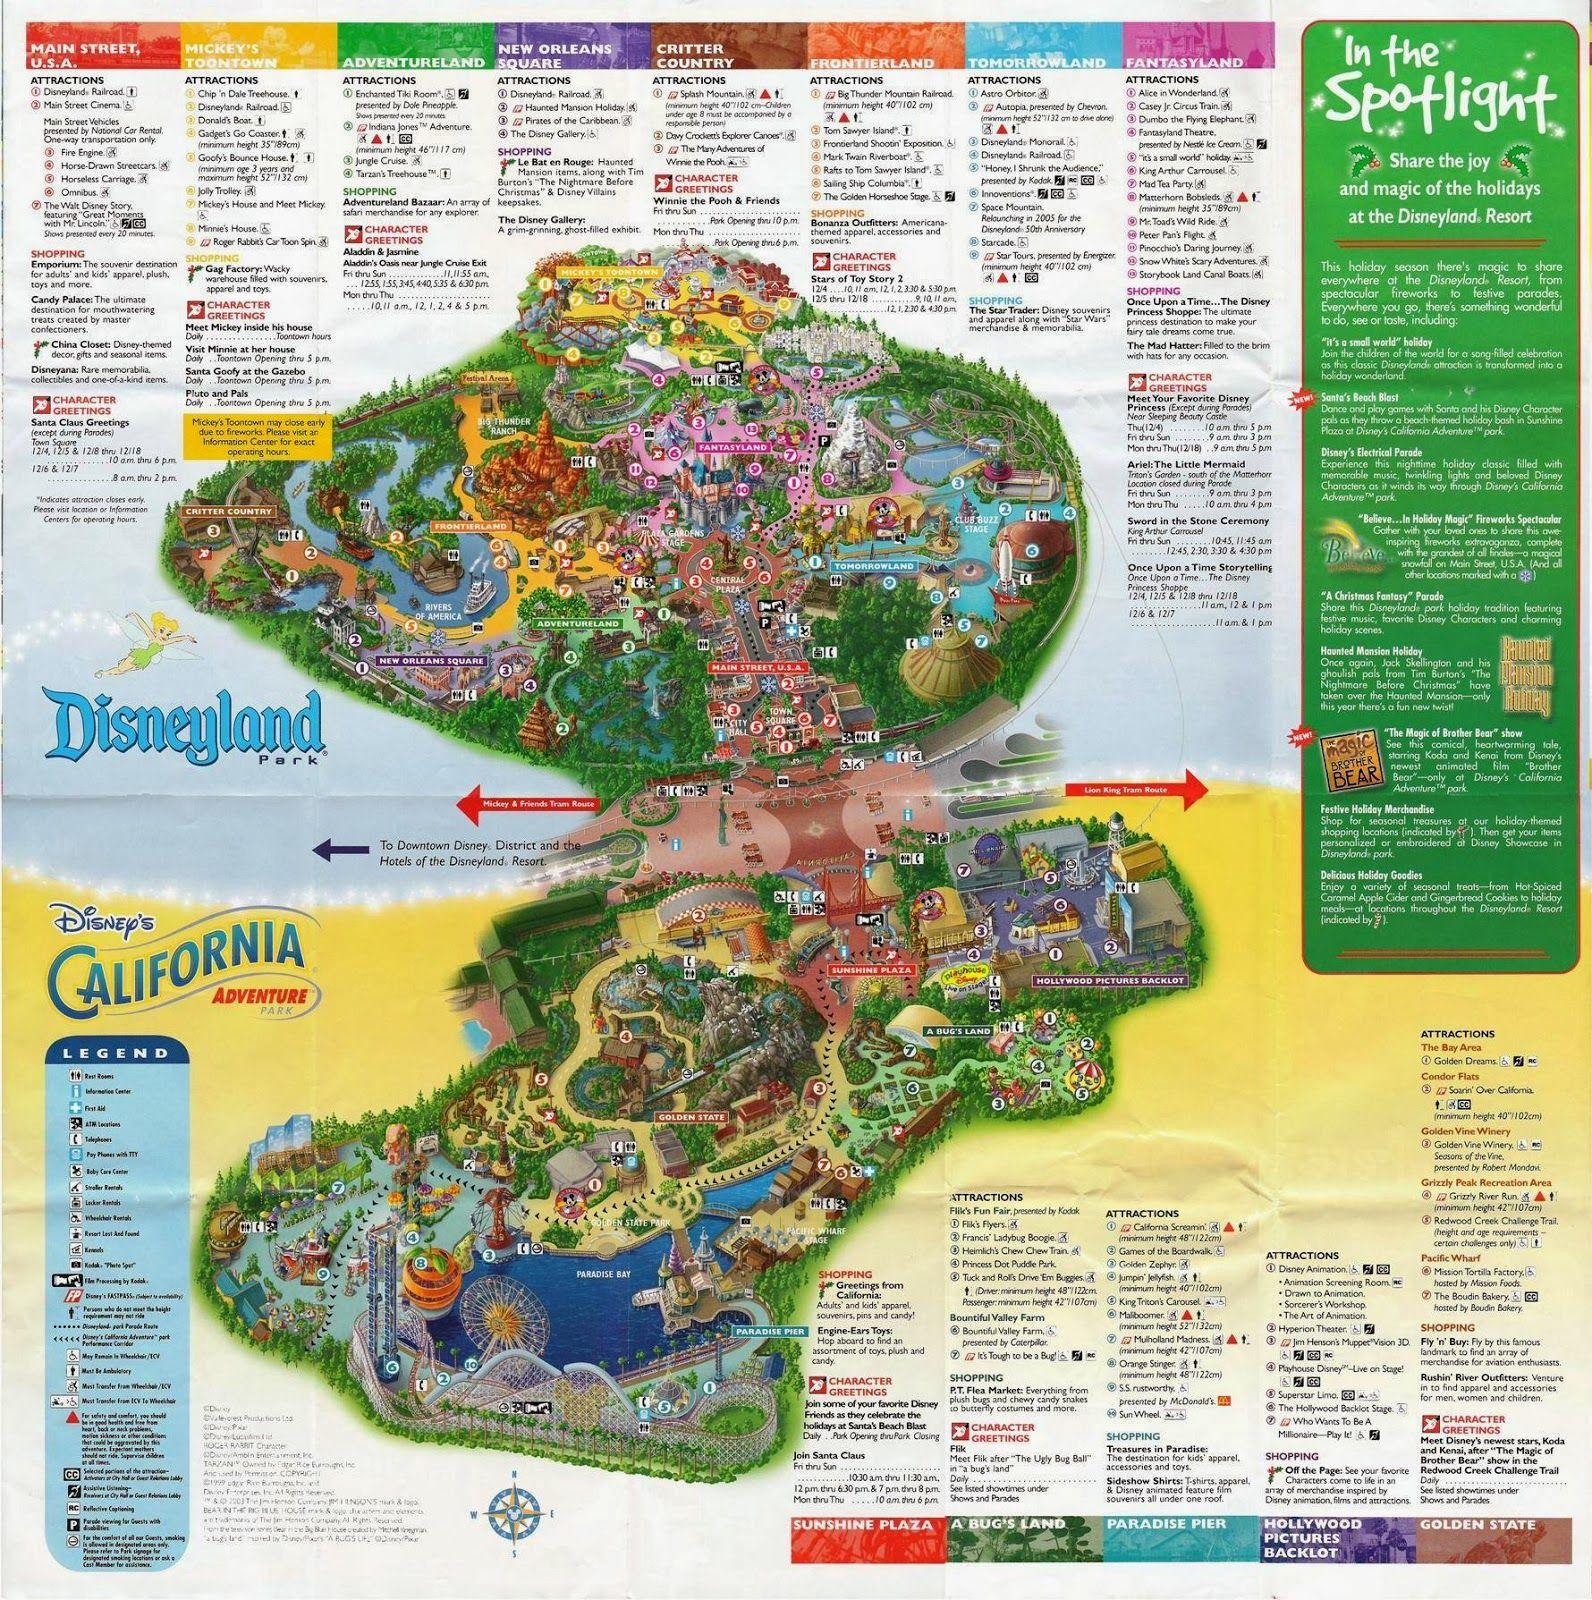 Disneyland Printable Park Map 2014 File Name